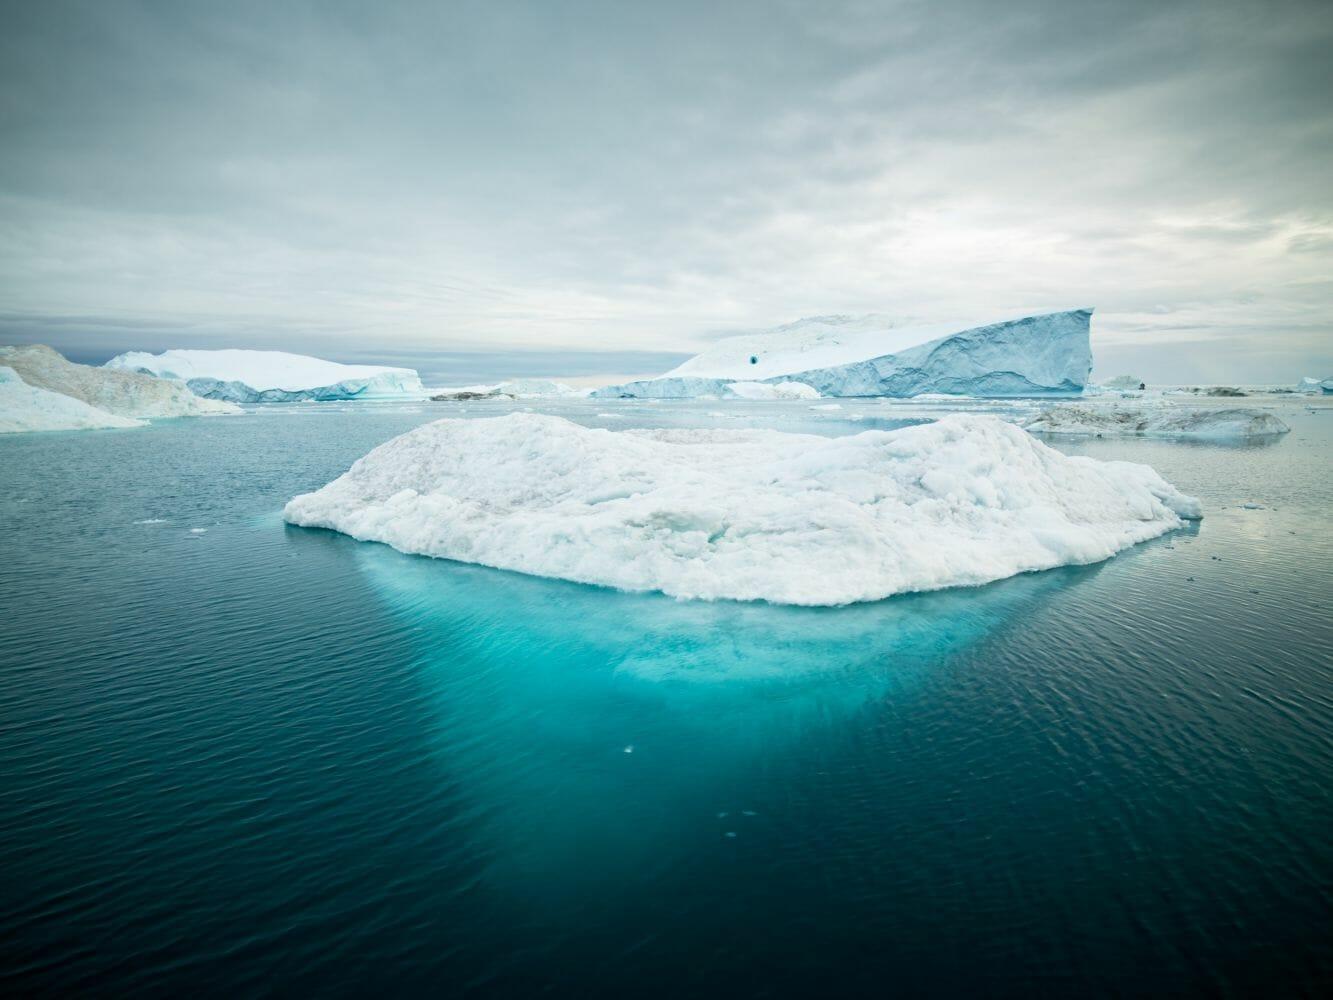 transportar iceberg gigante 2